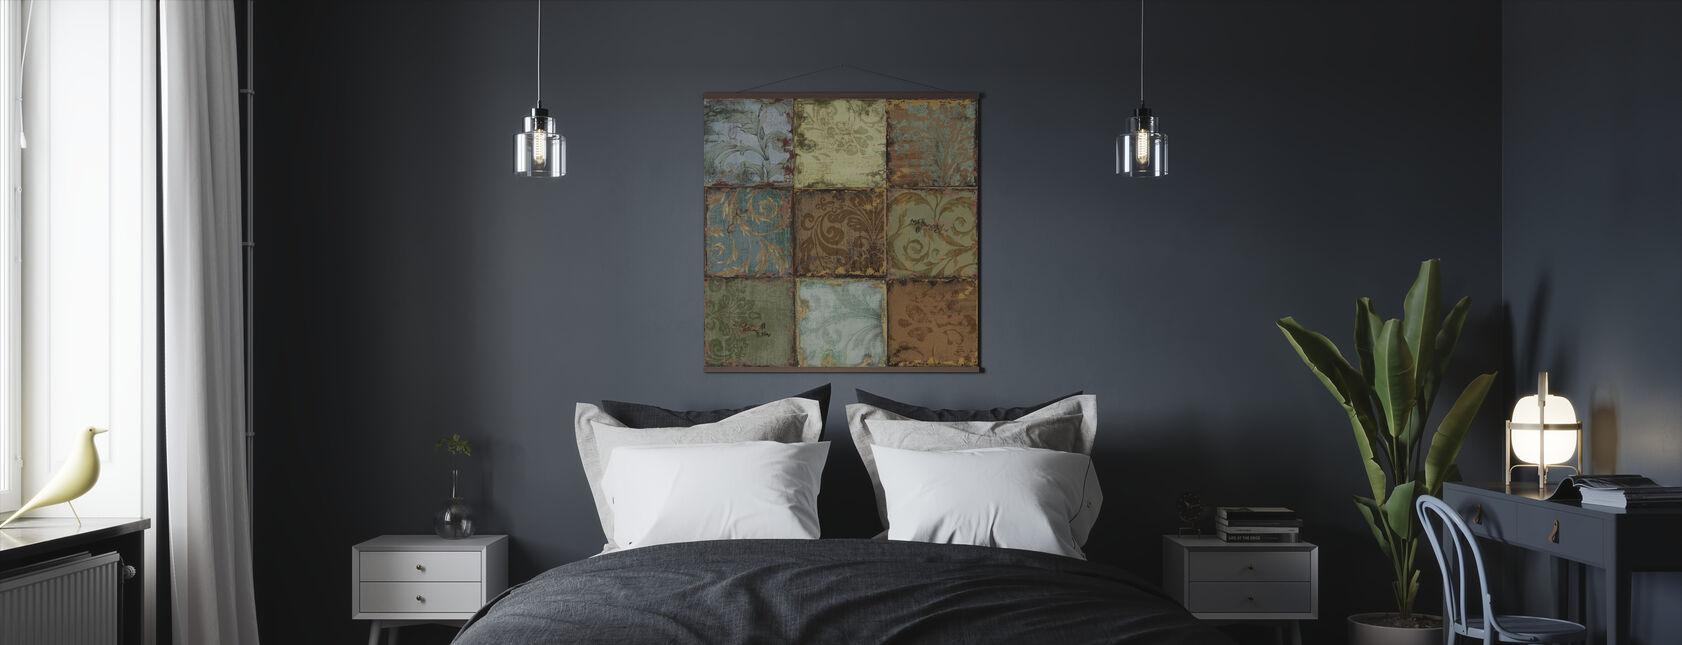 Tapestry Tegels 1 - Poster - Slaapkamer